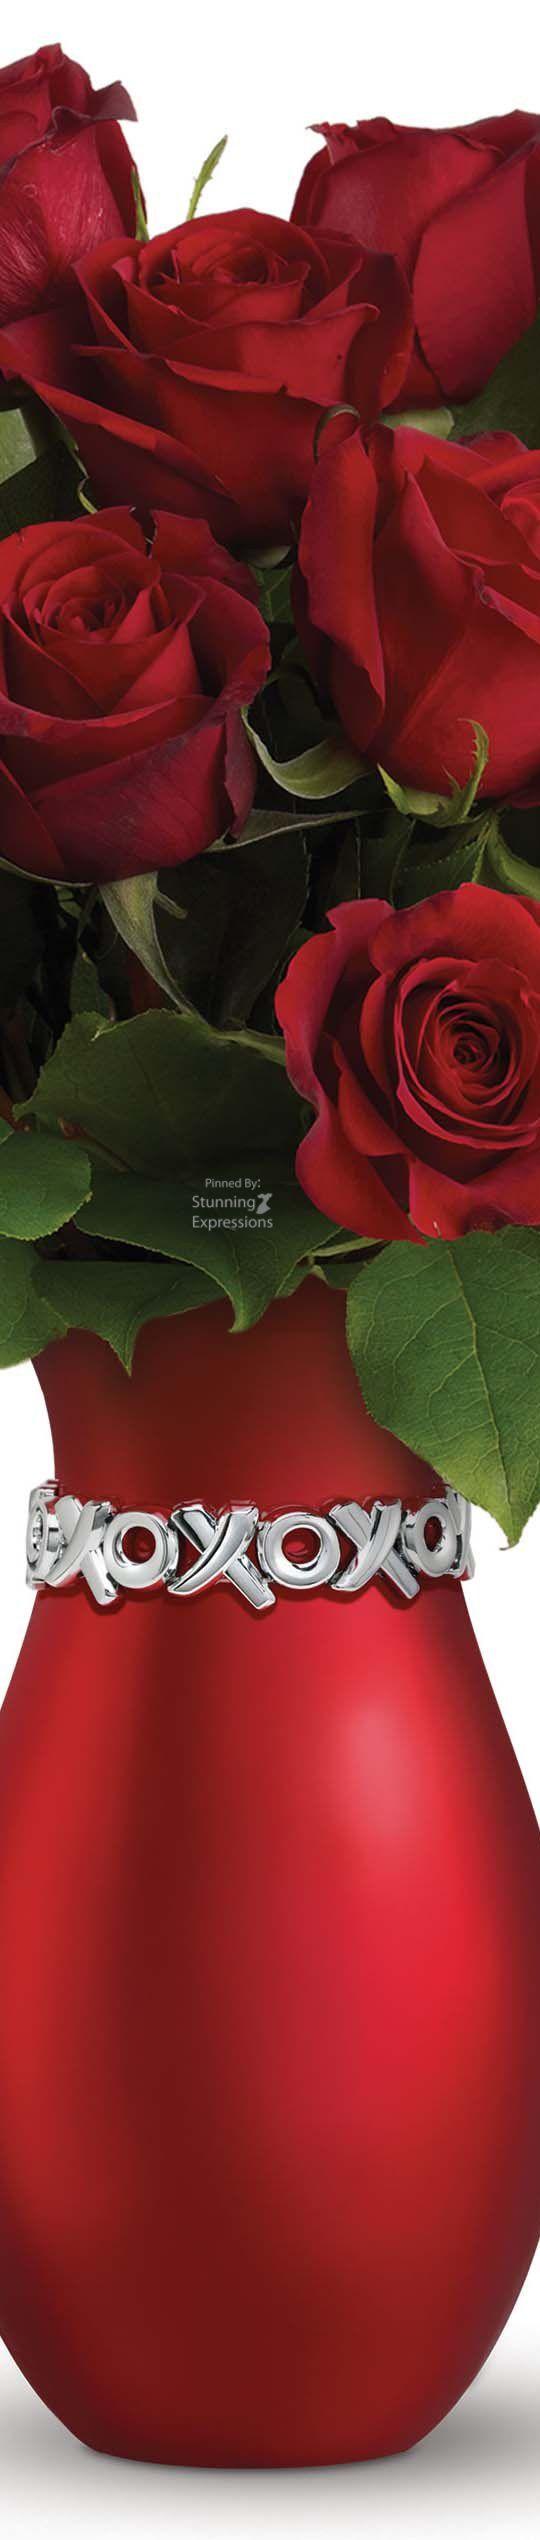 Floral Centerpieces | Roses